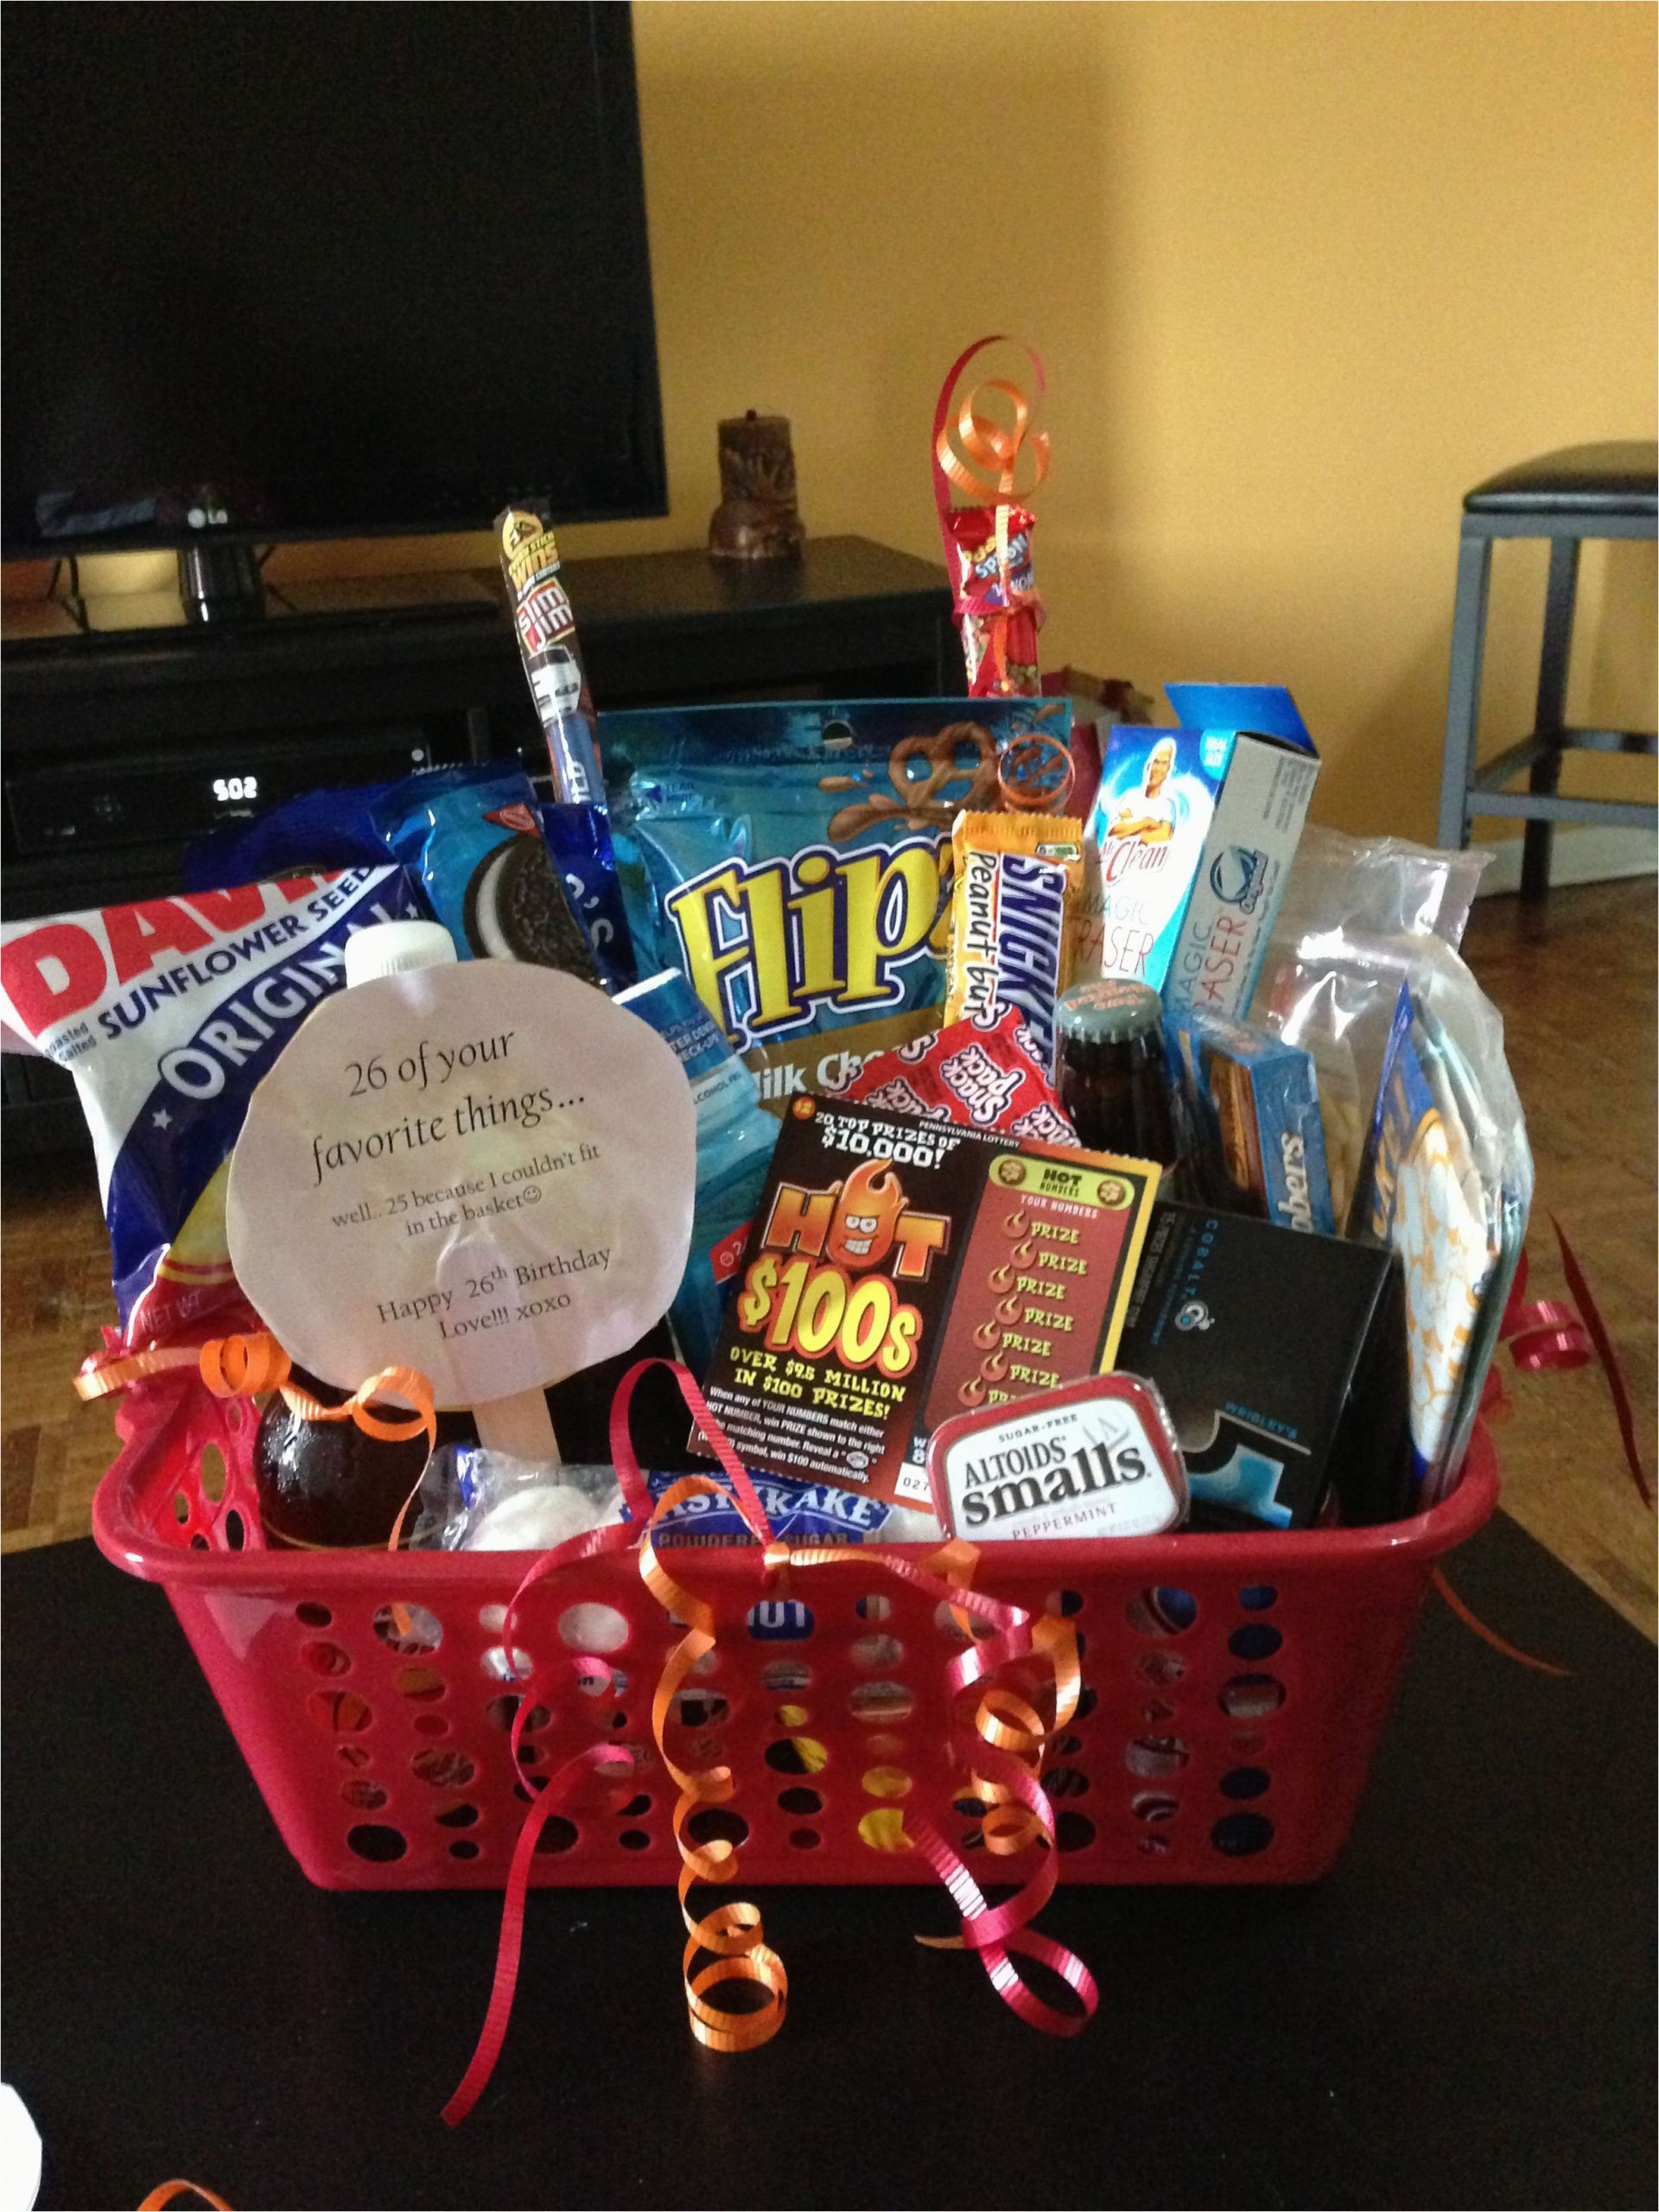 Birthday Presents for Boyfriend 20th Boyfriend Birthday Basket 26 Of His Favorite Things for